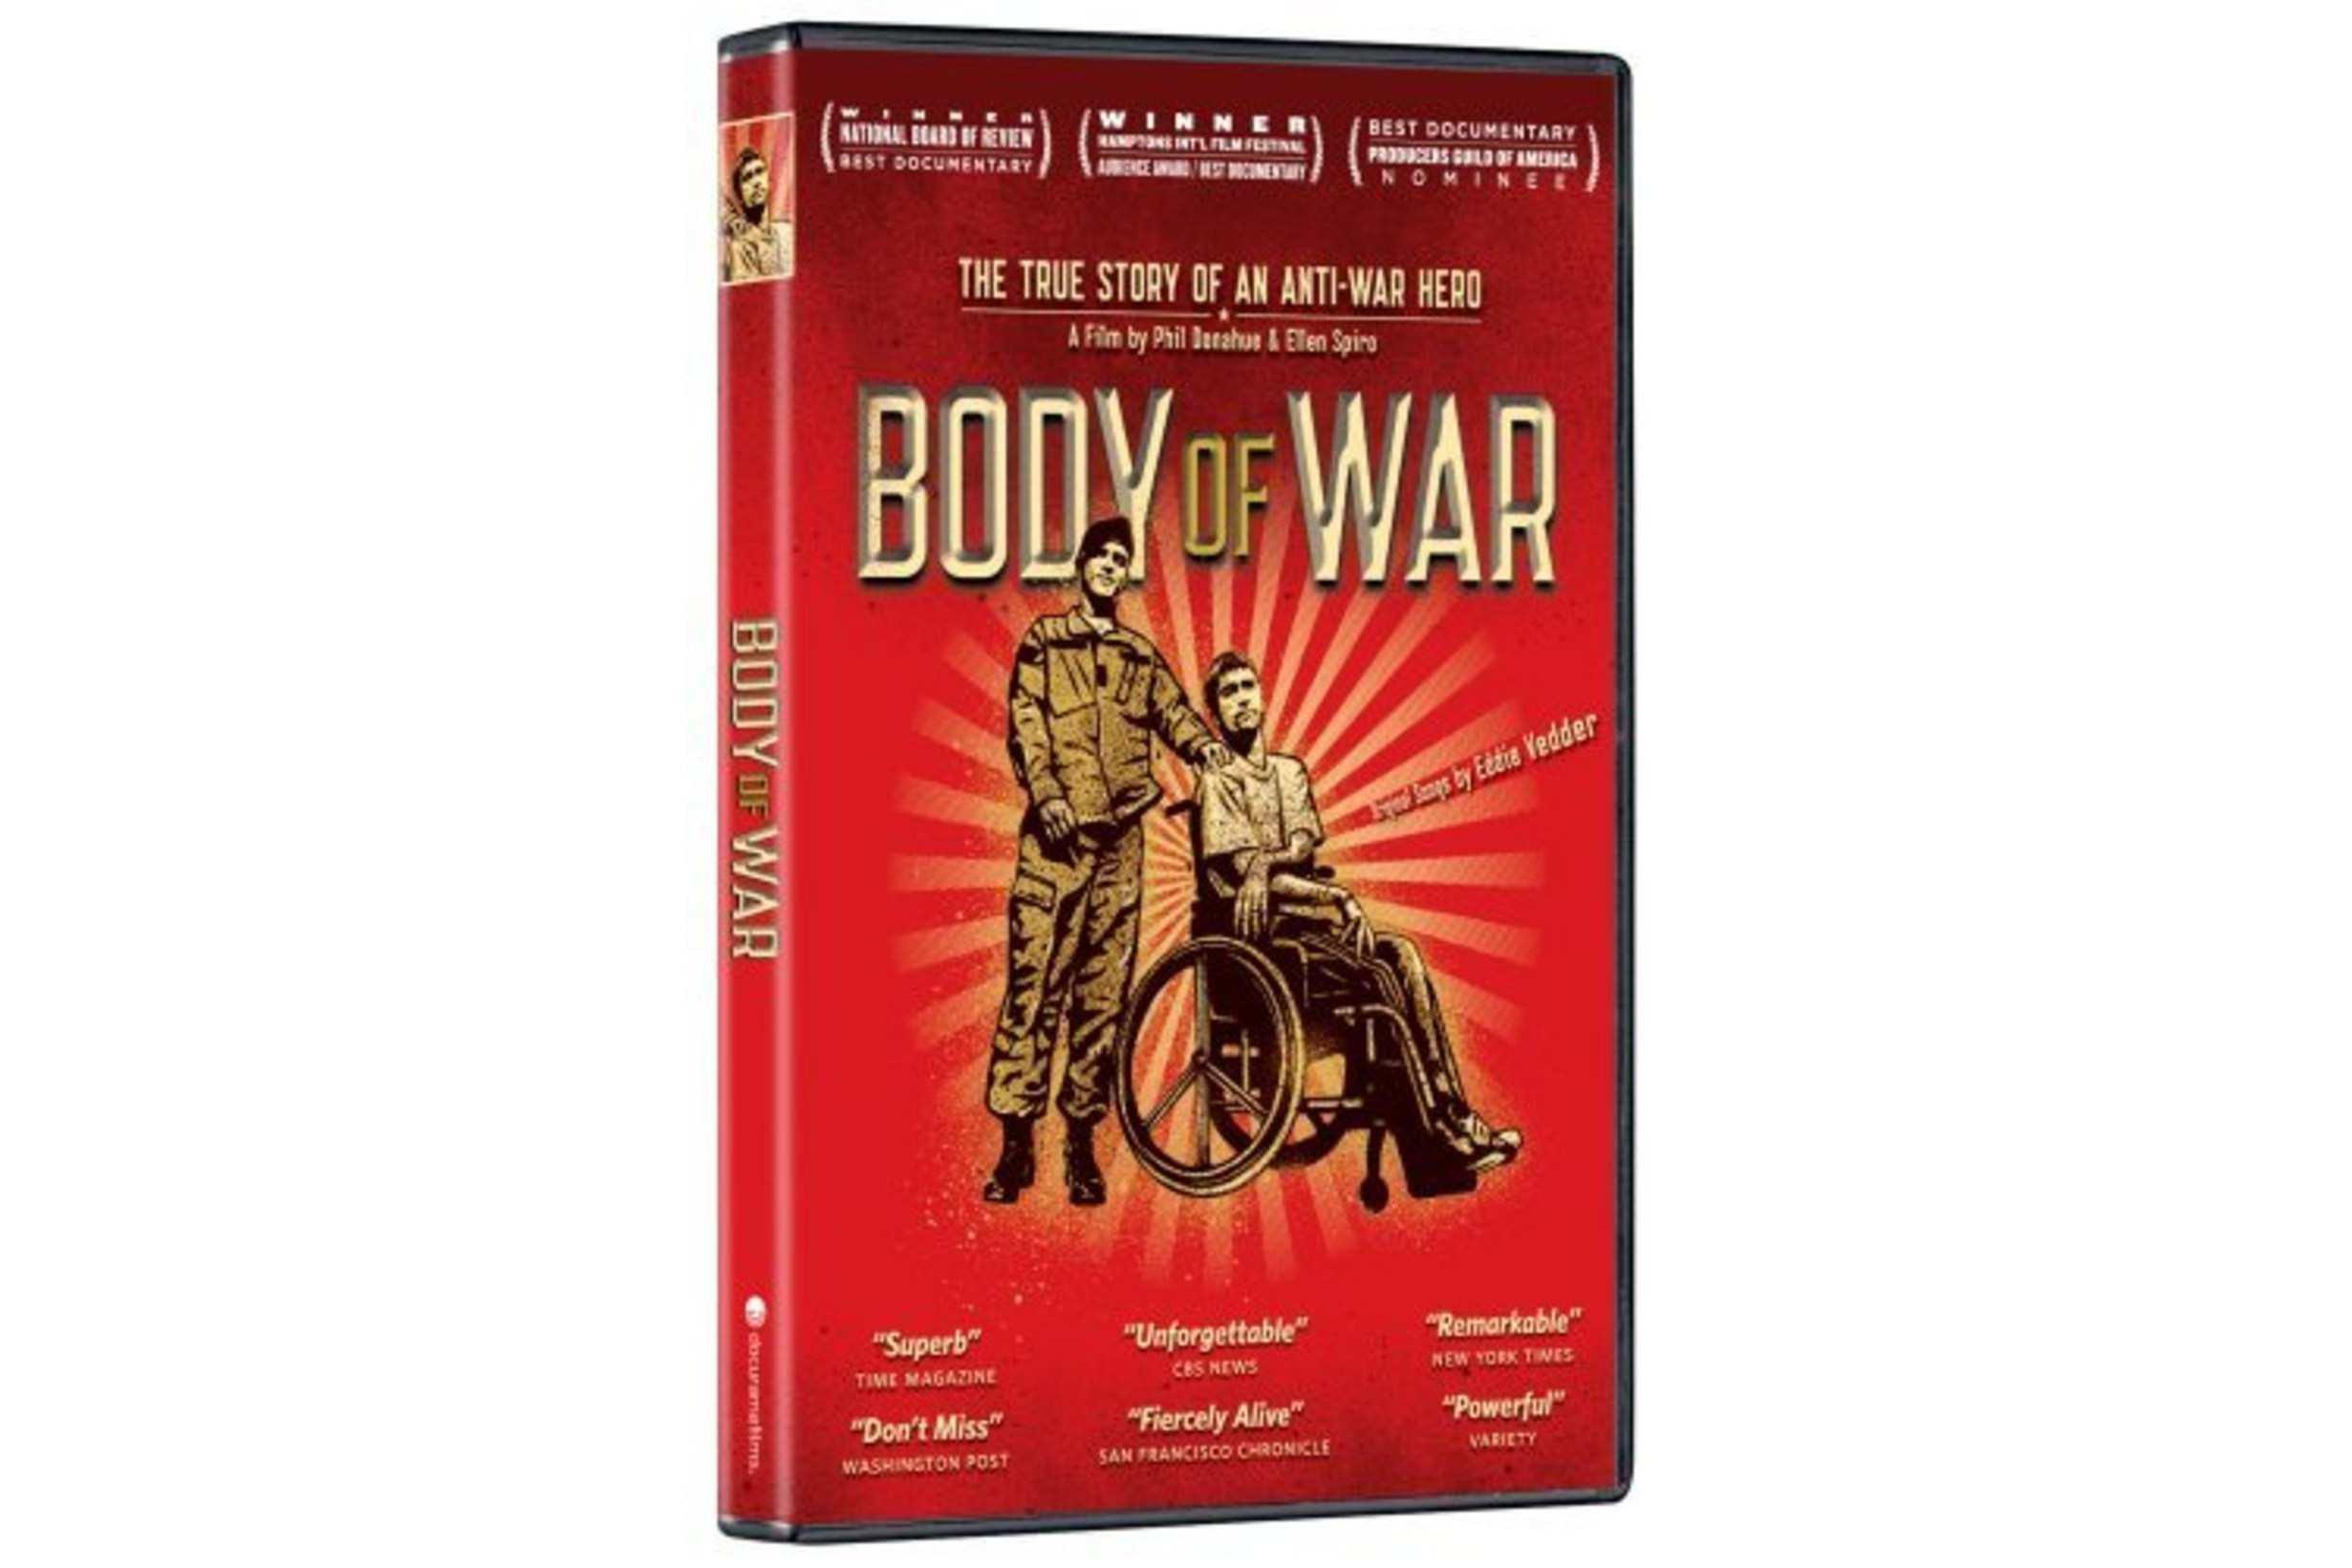 Body of War DVD